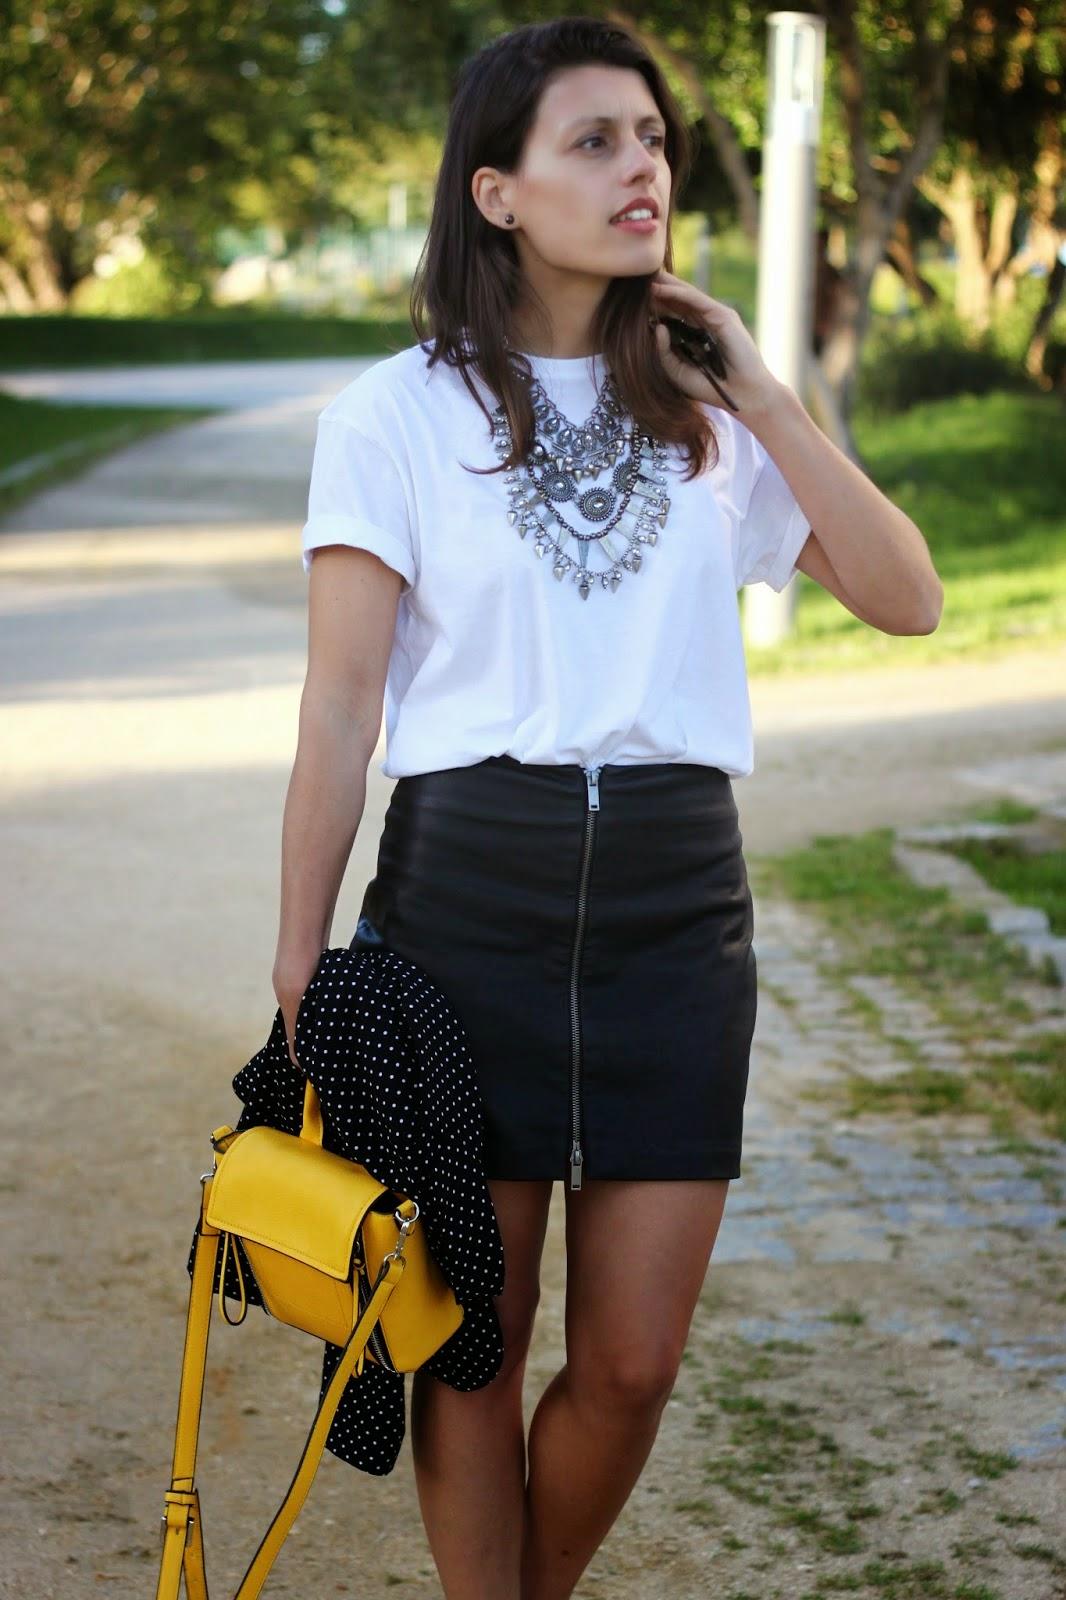 http://ilovefitametrica.blogspot.pt/2014/06/plain-white-t-shirt.html